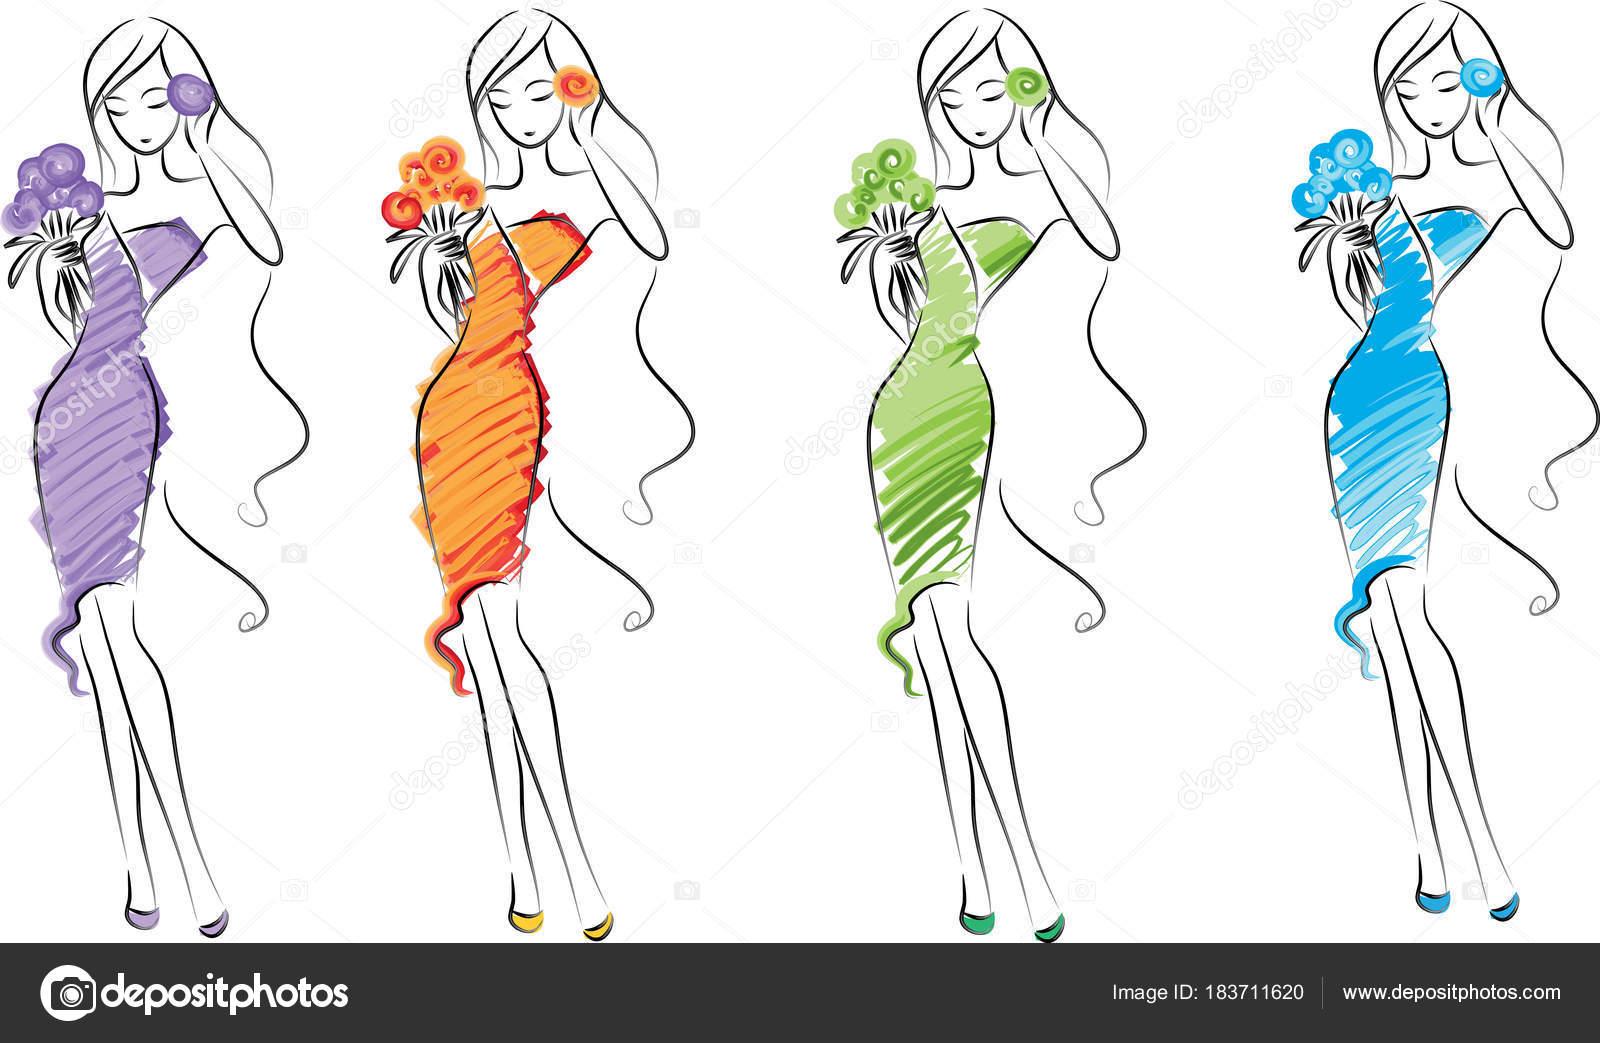 Dibujos Diseños De Moda Vector Moda Belleza Dibujo Diseño